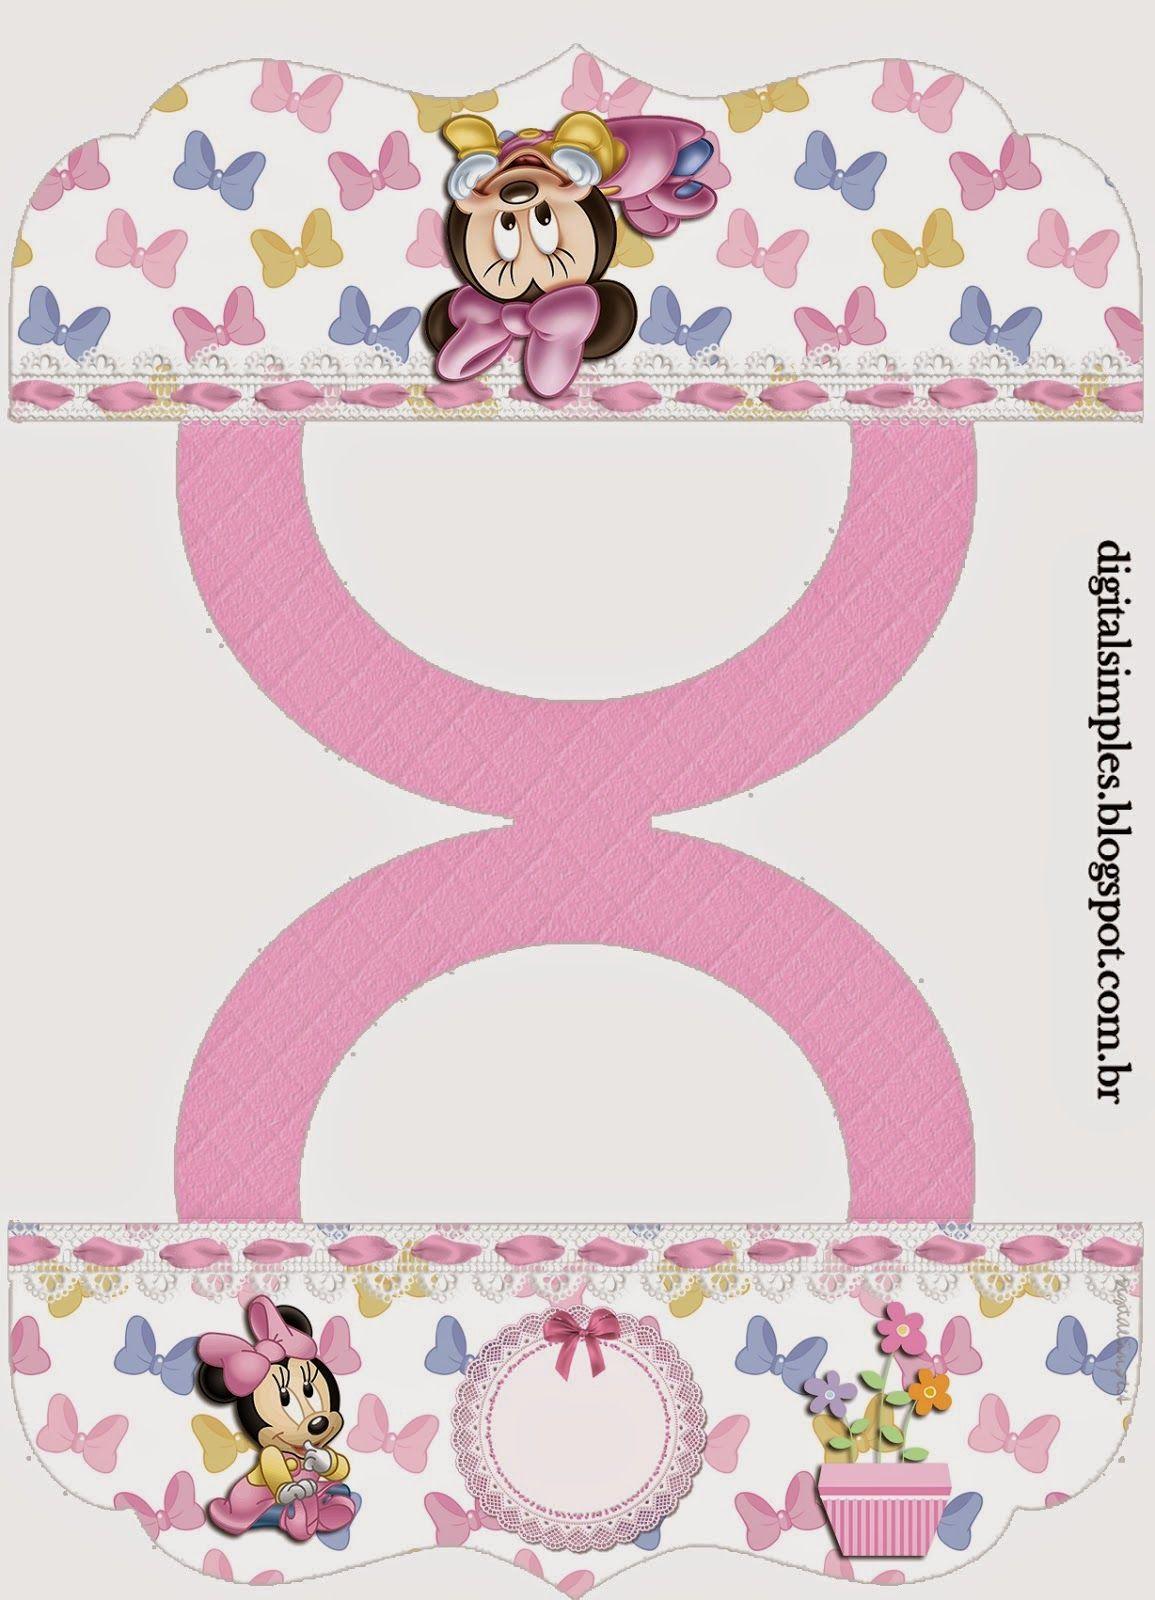 Minnie beb etiquetas para candy bar para imprimir gratis - Candy candy diva futura ...